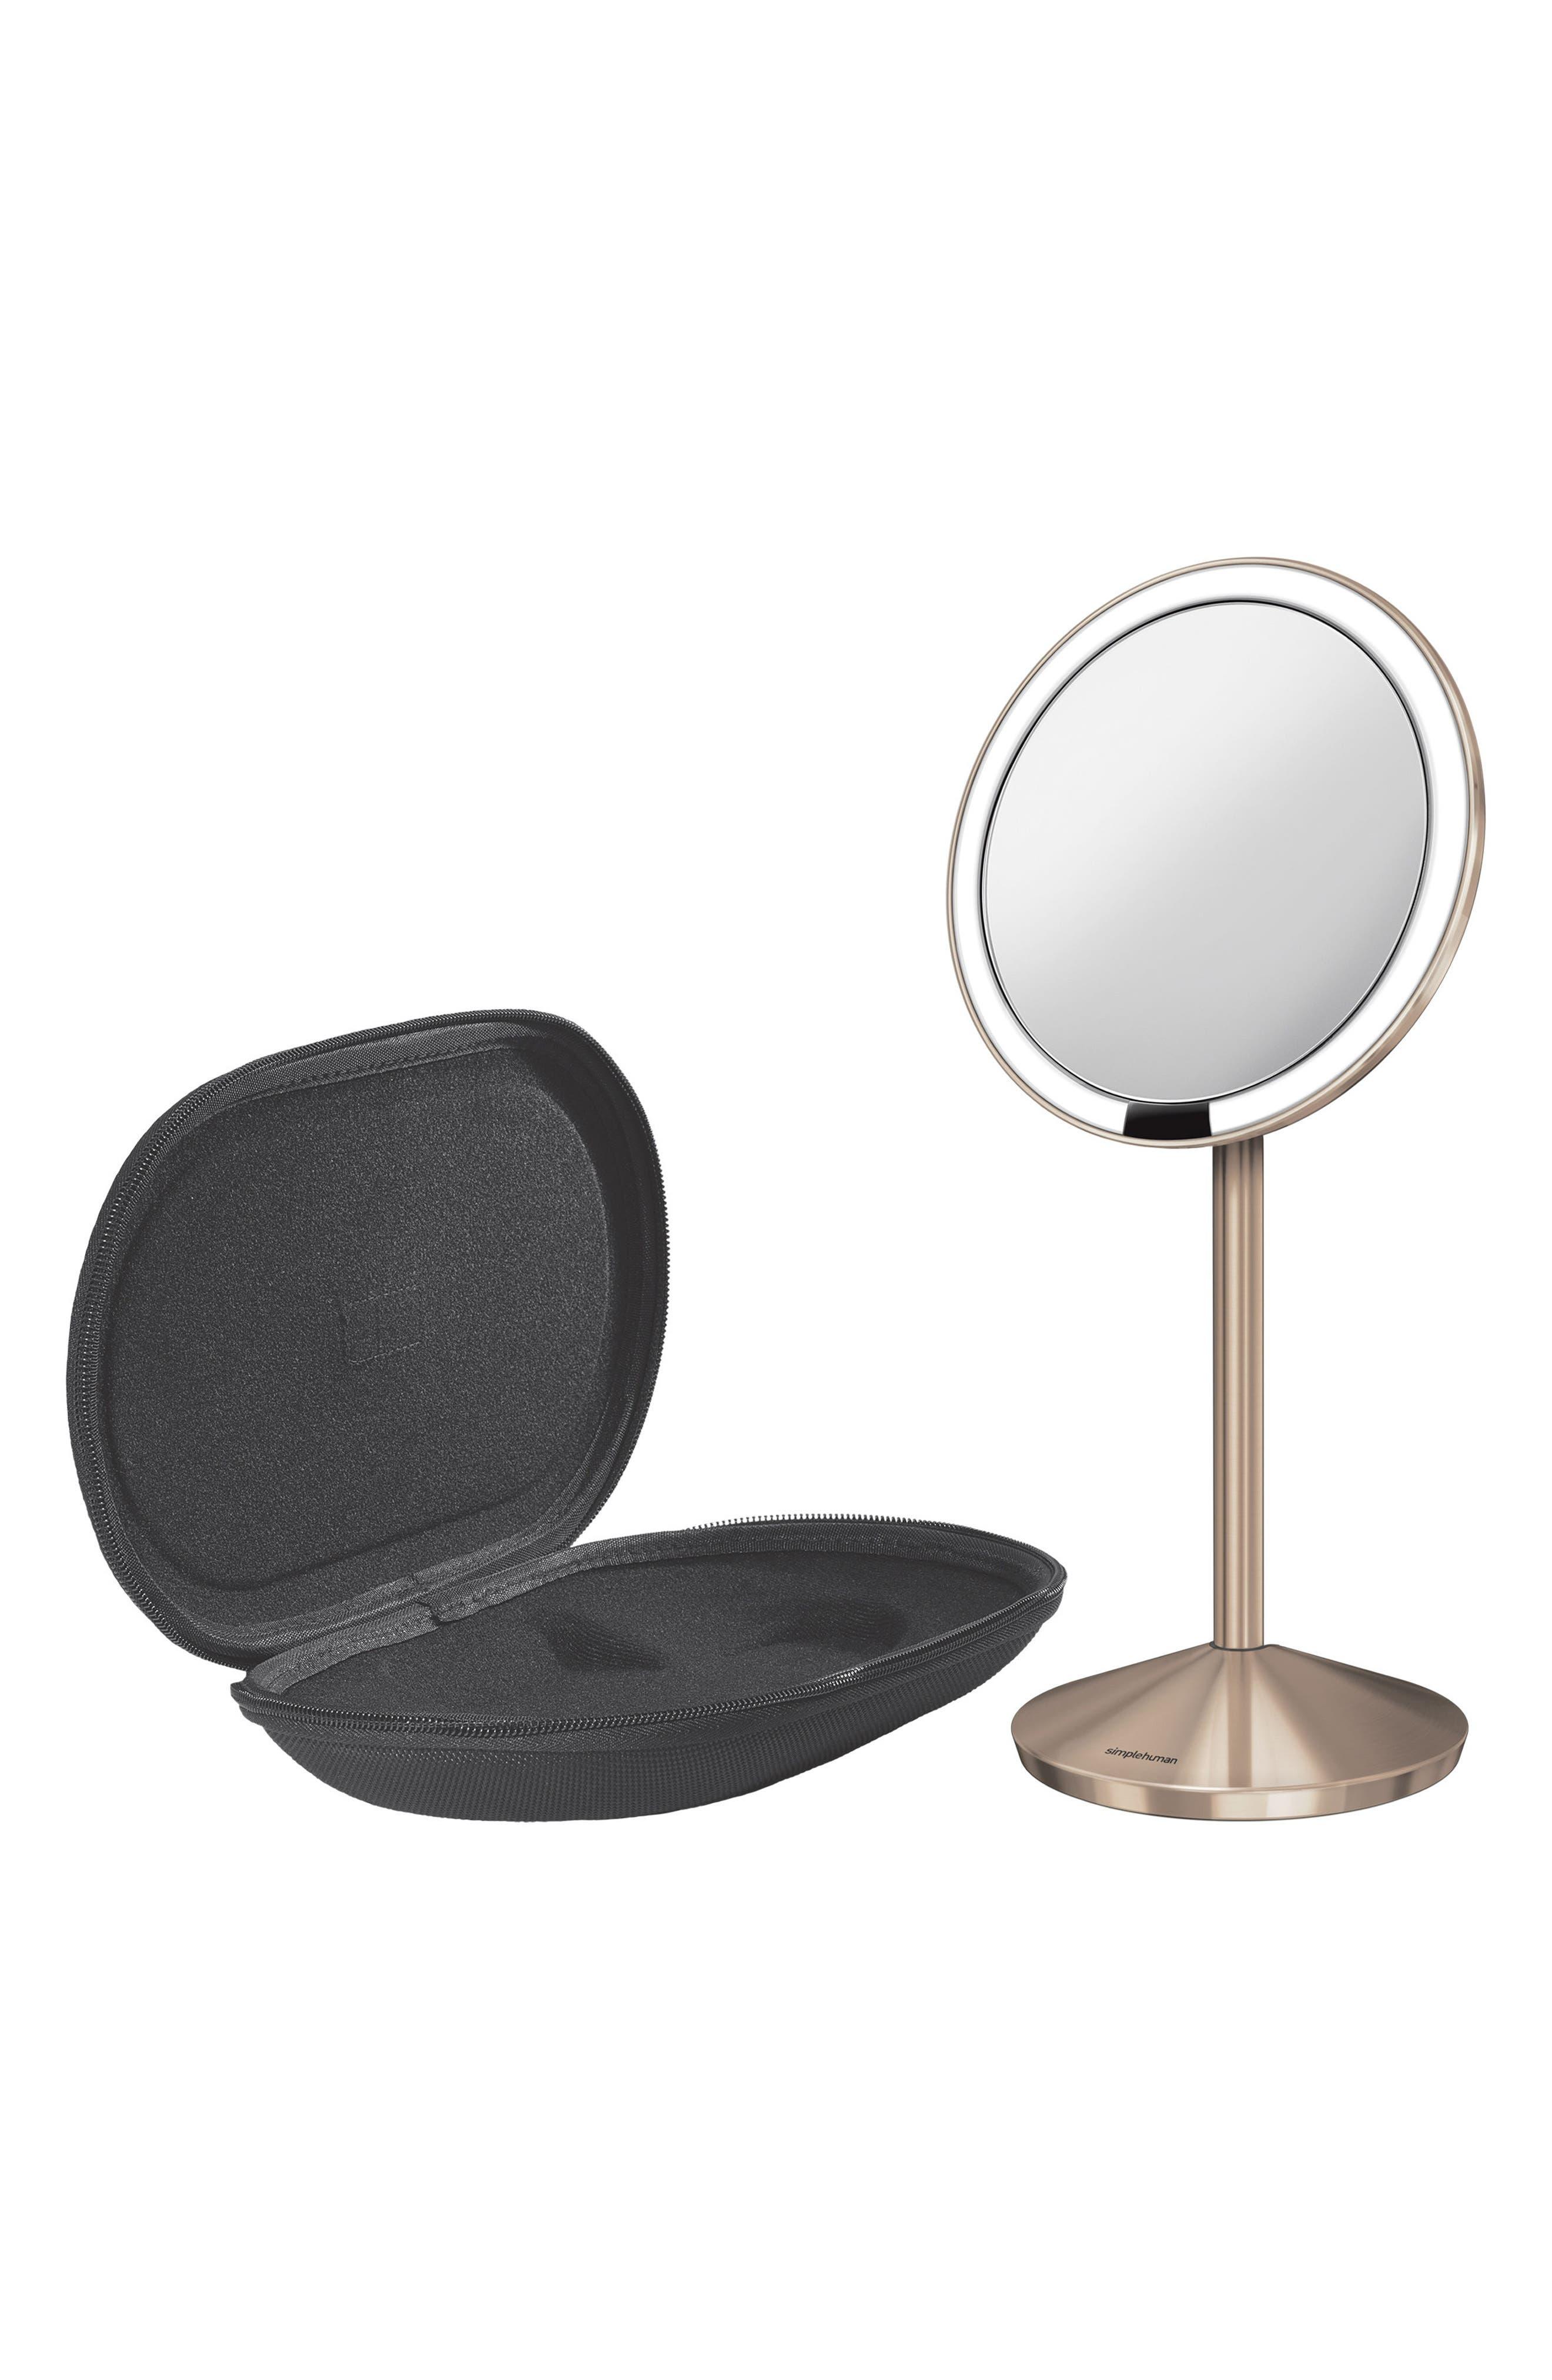 Mini Countertop Sensor Makeup Mirror,                             Alternate thumbnail 2, color,                             SILVER